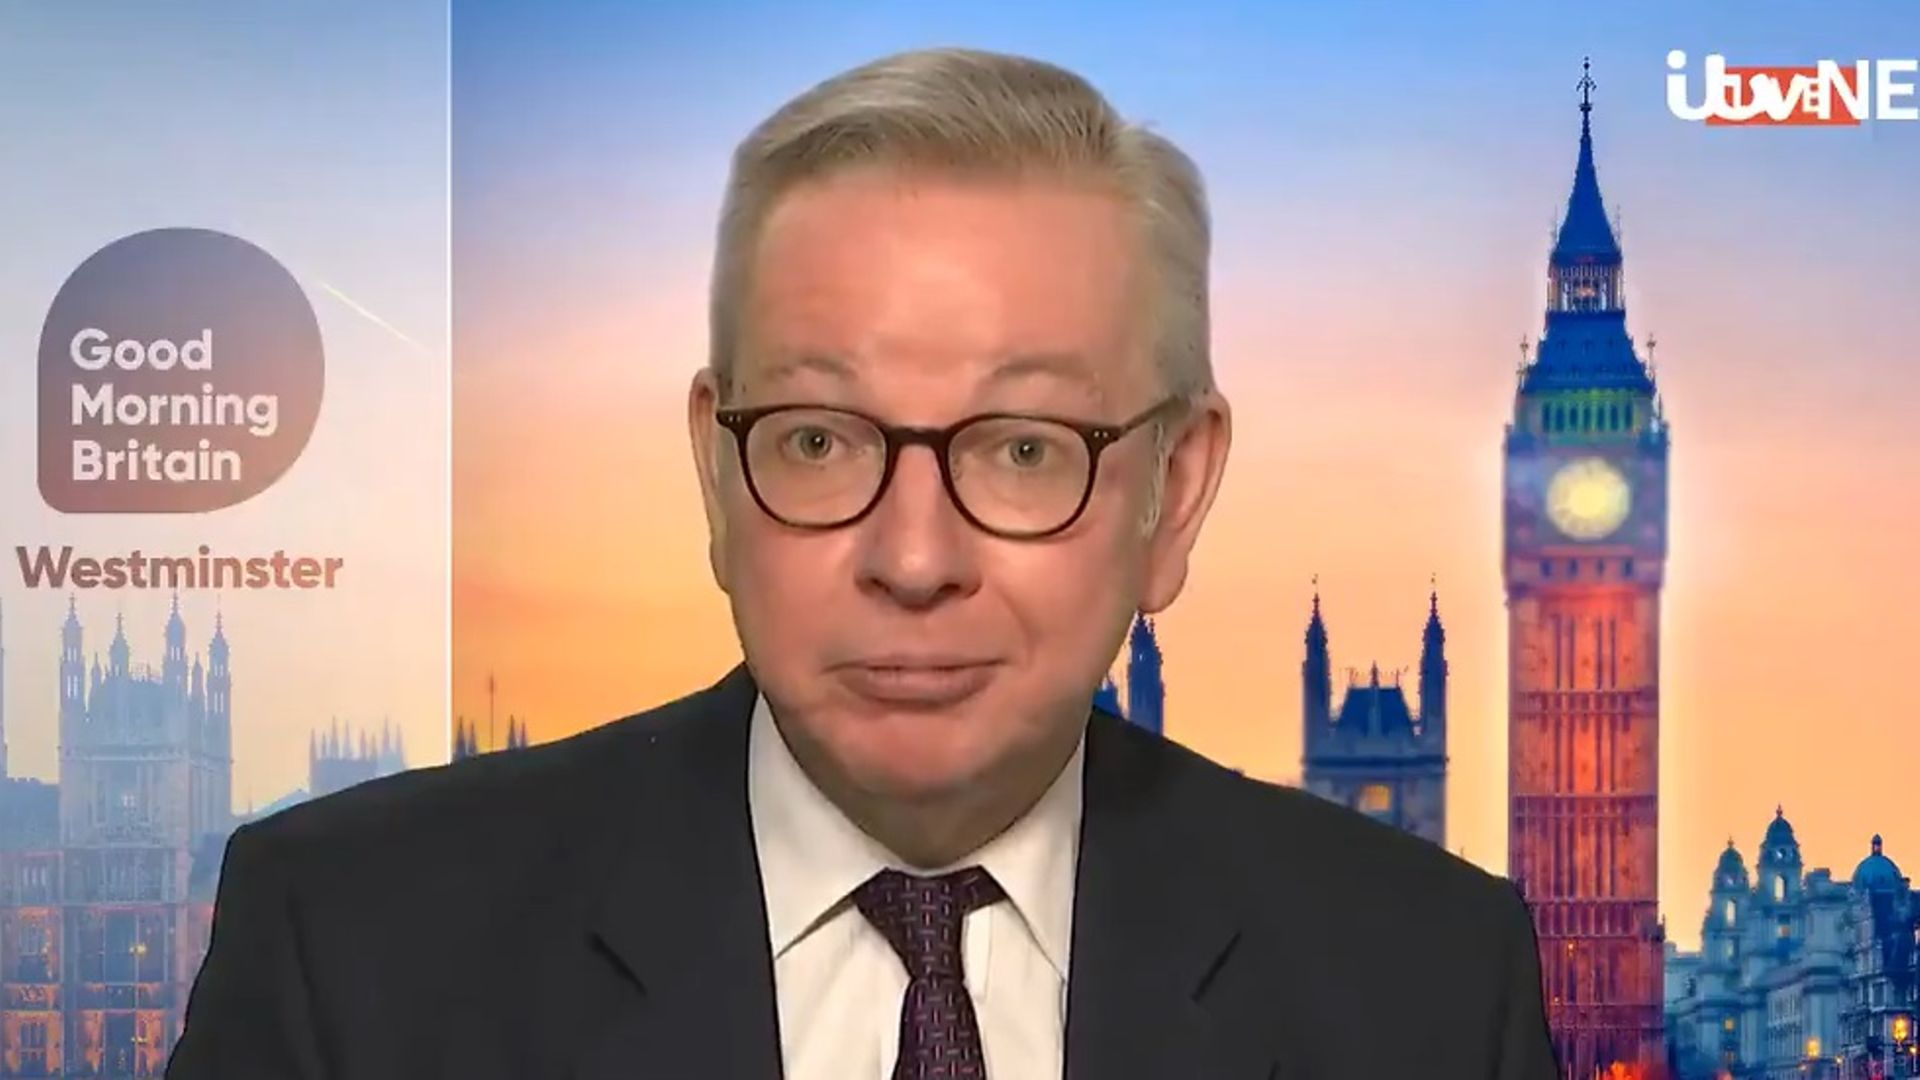 Michael Gove on Good Morning Britain - Credit: ITV